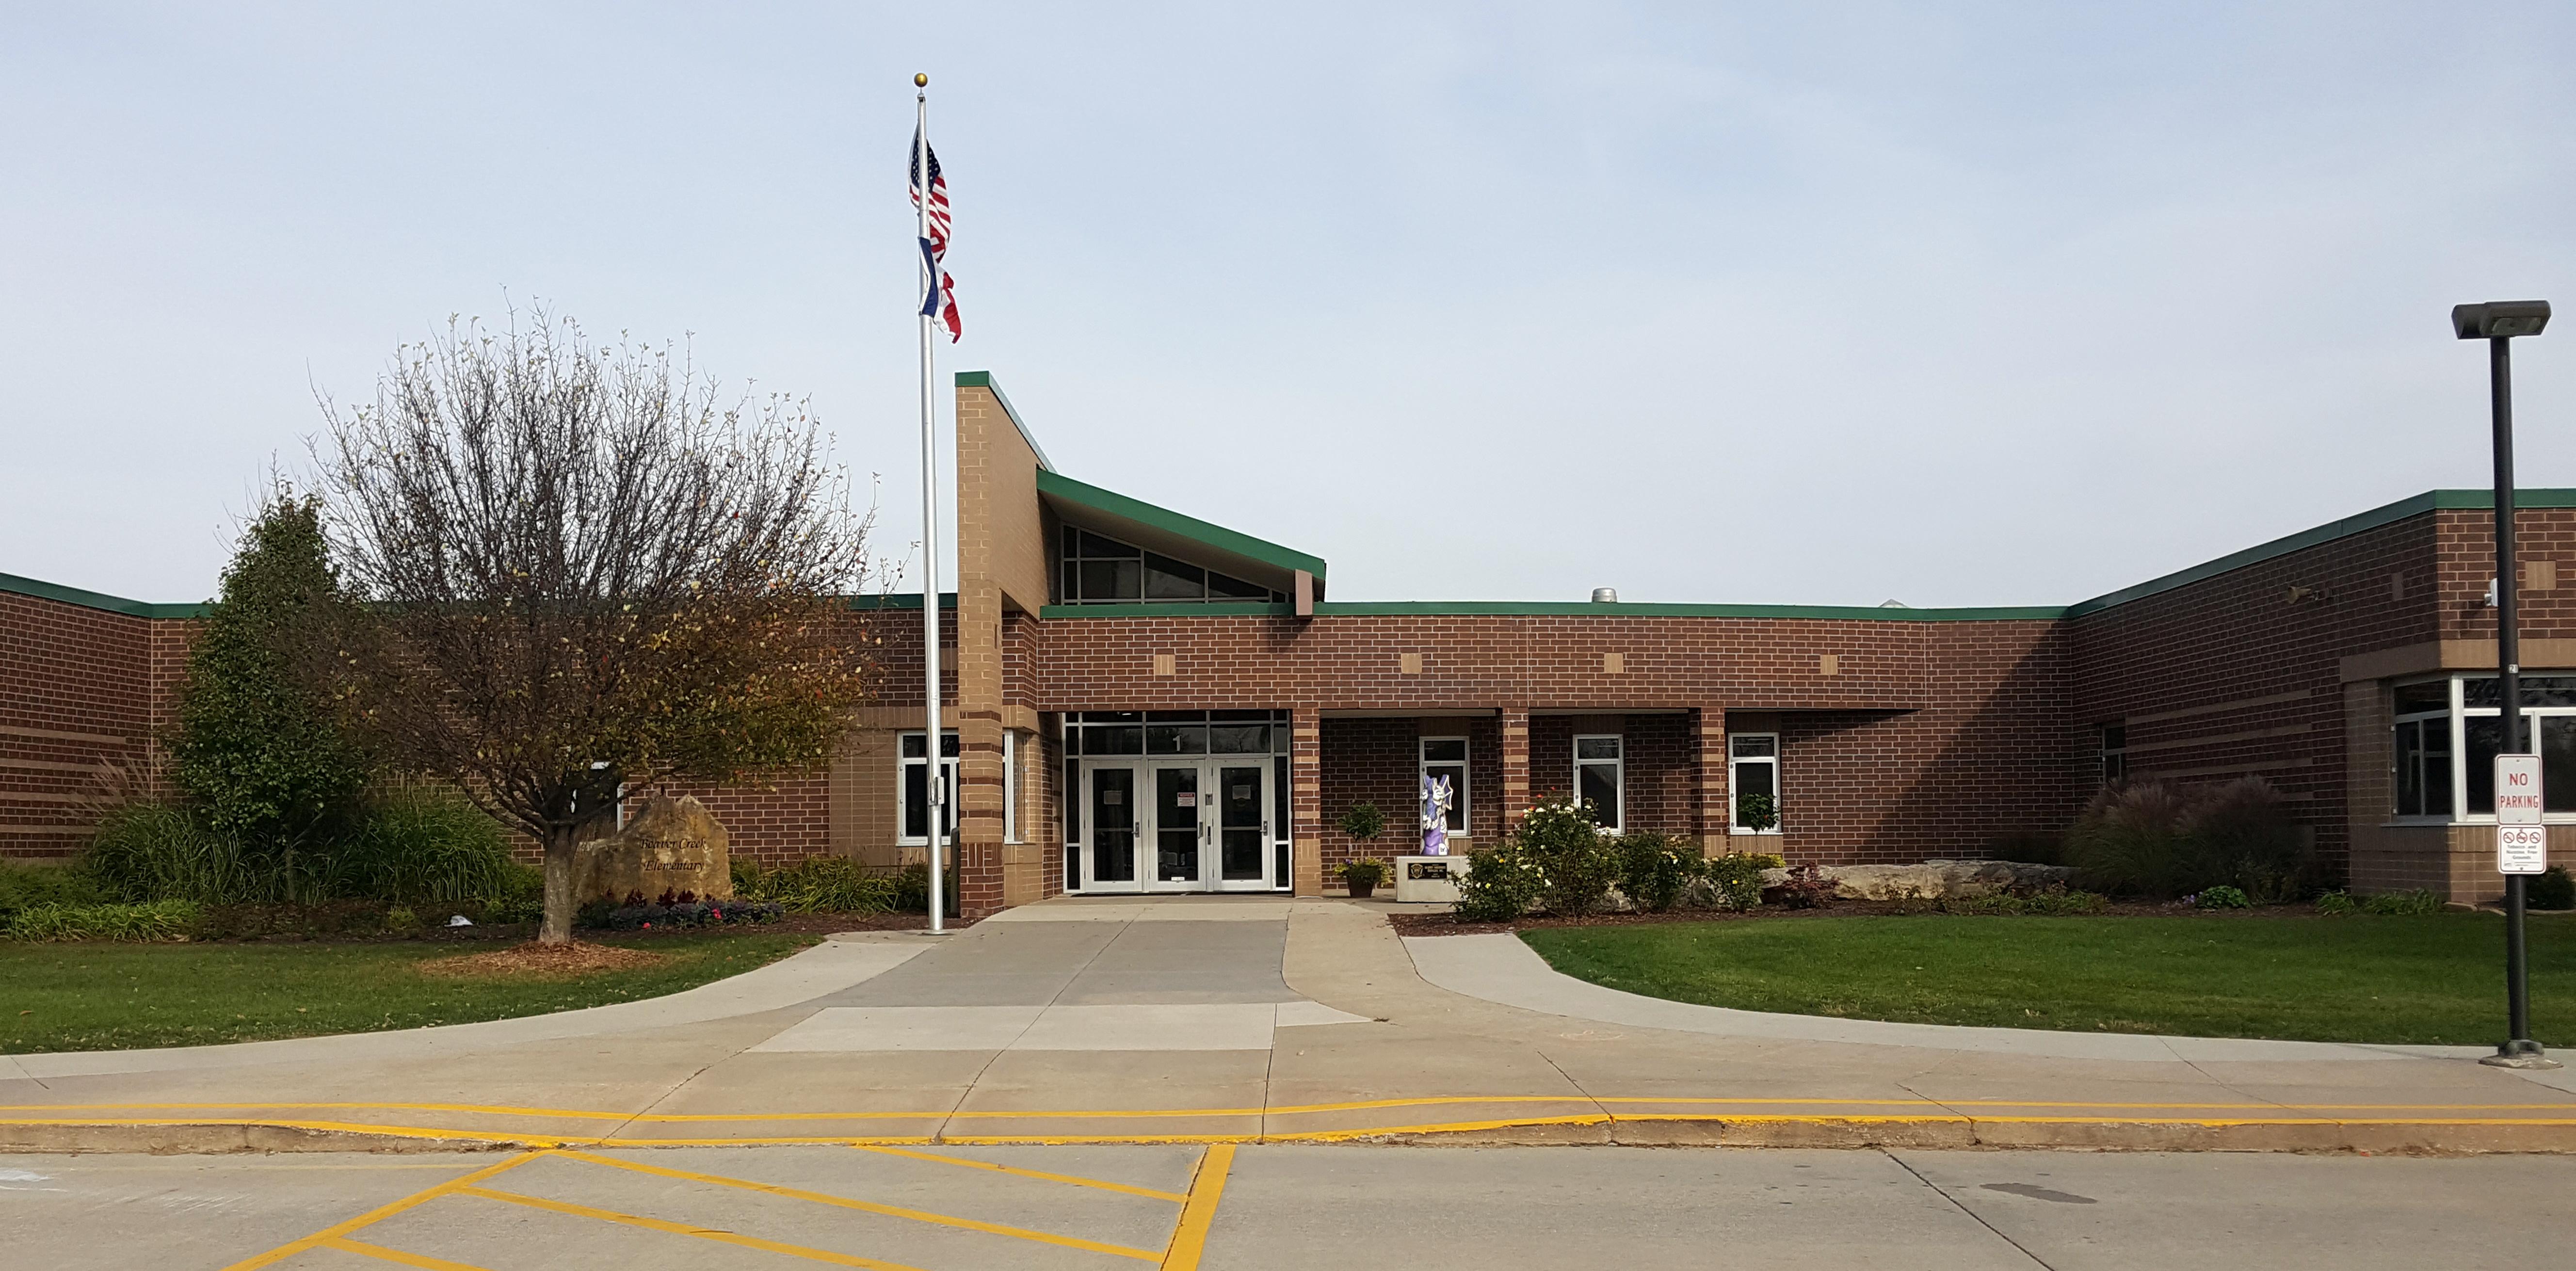 Beaver Creek Elementary